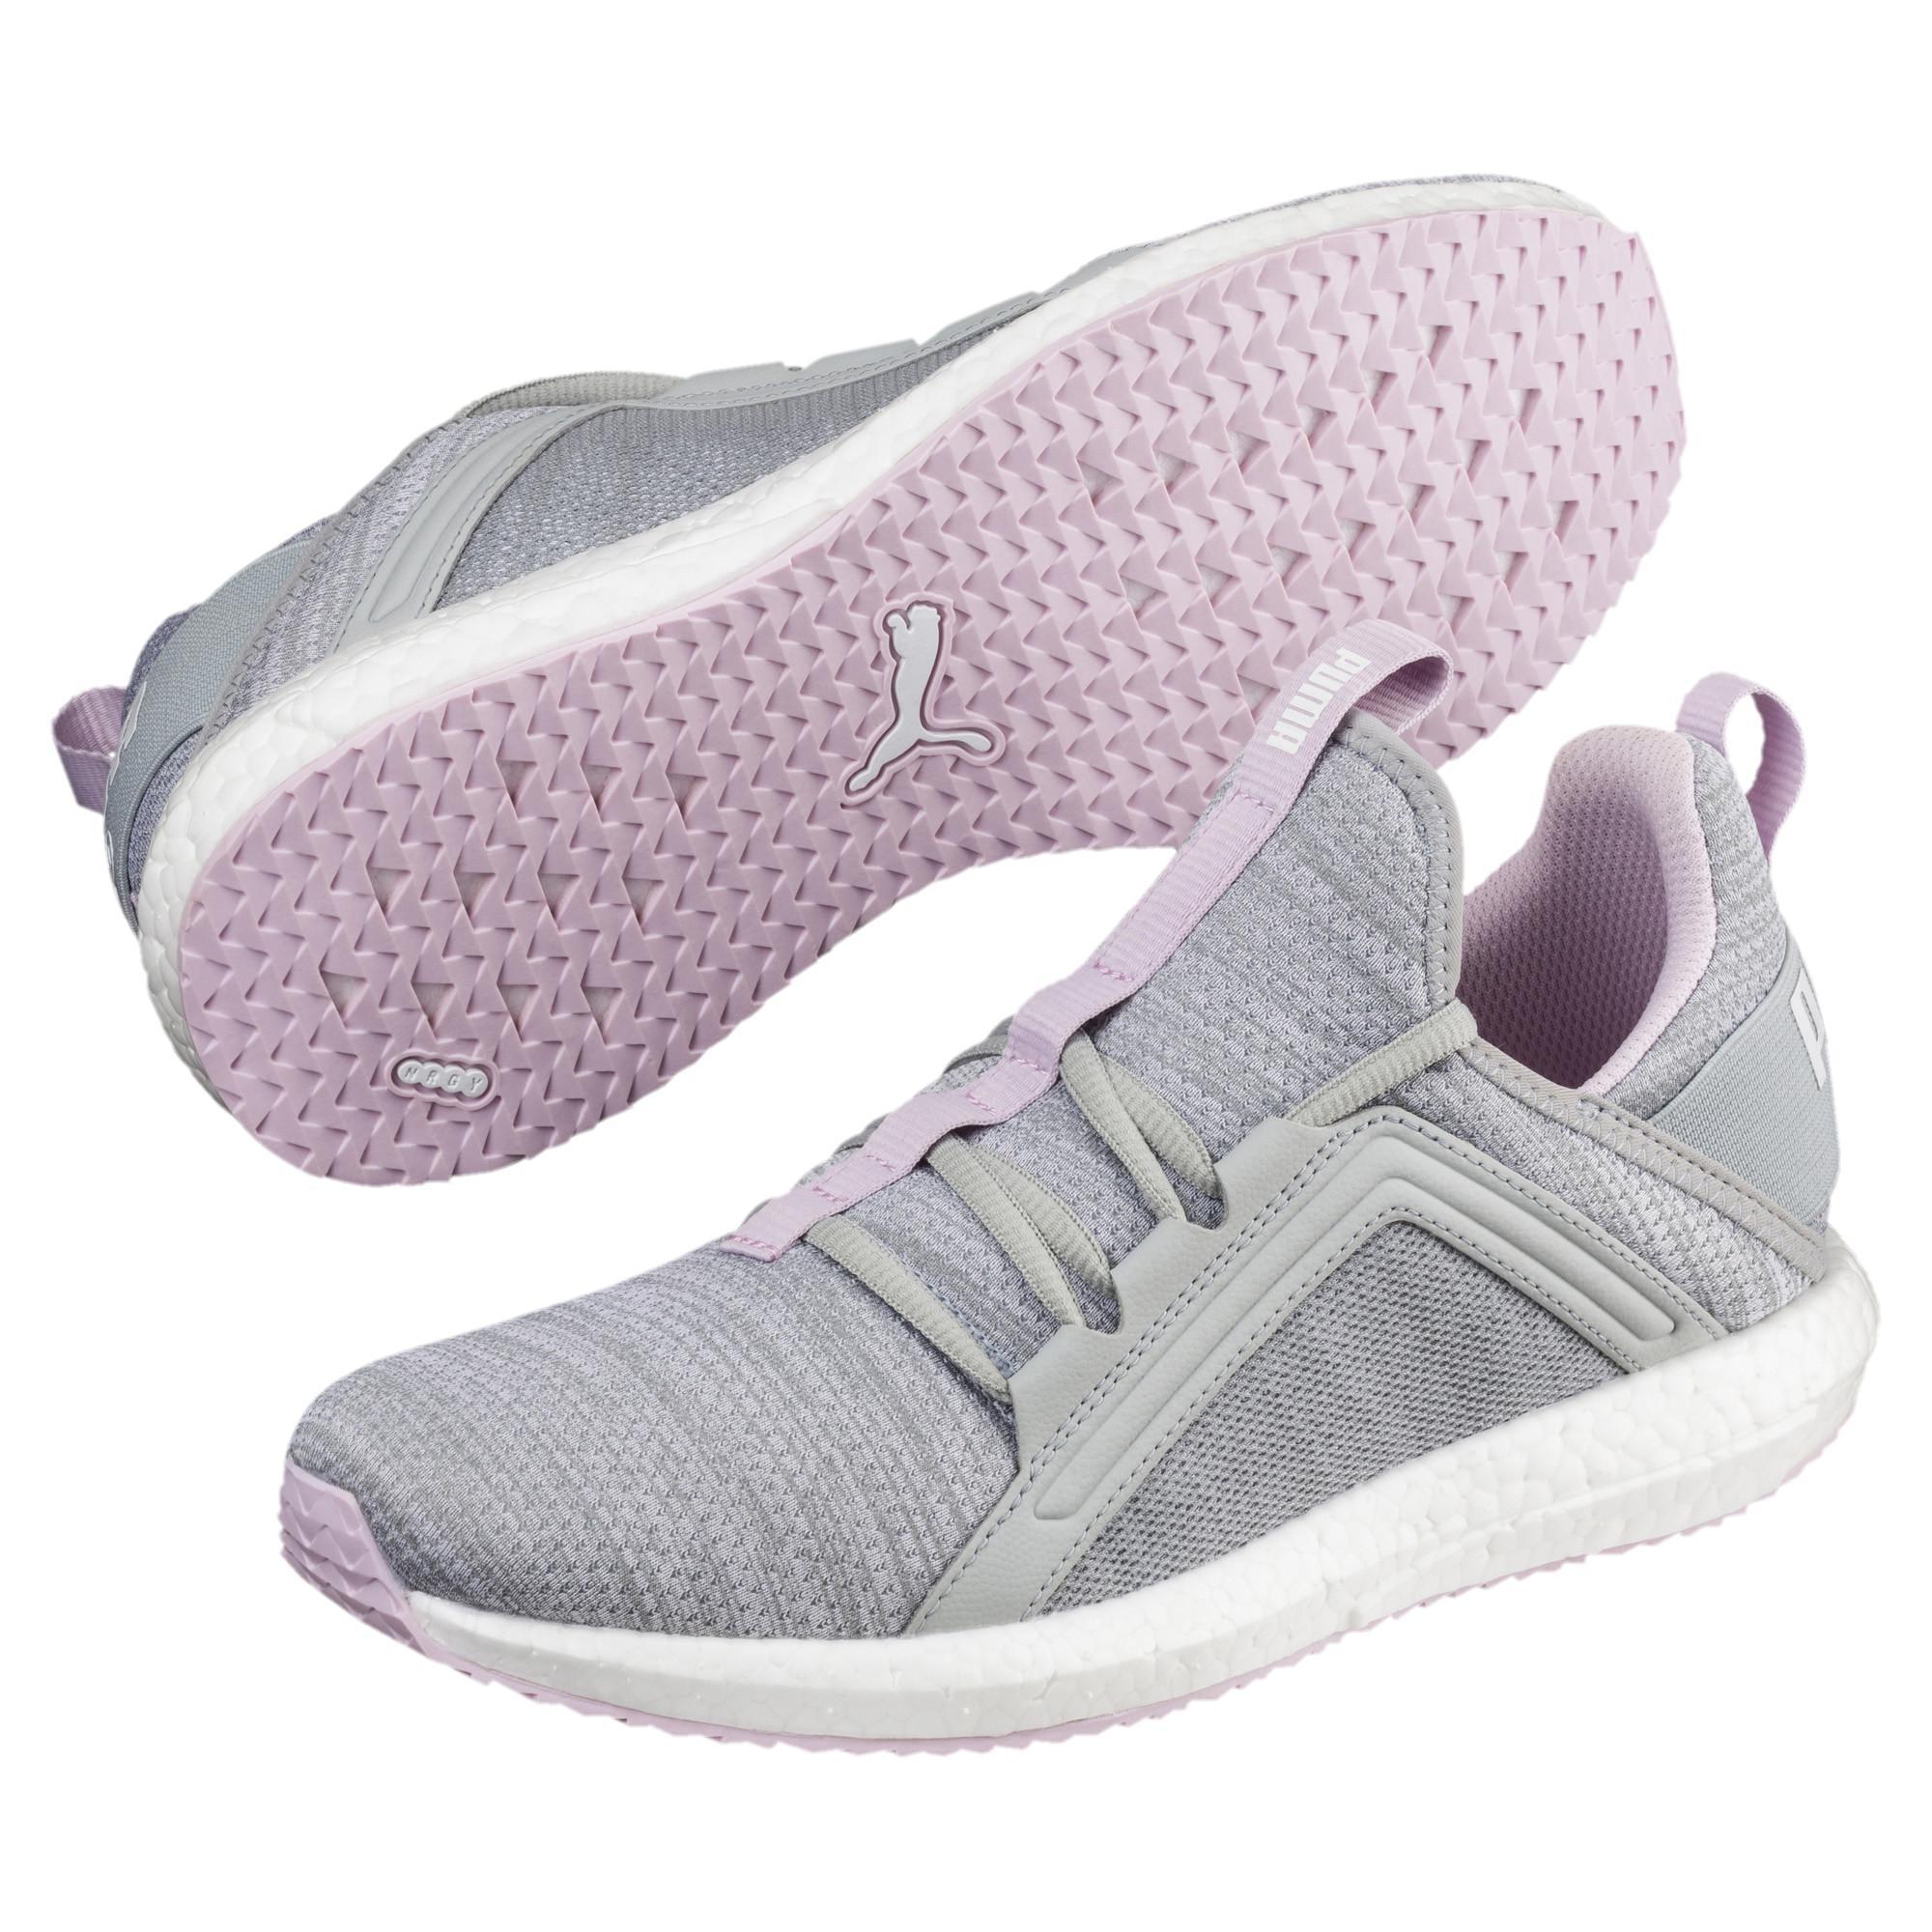 PUMA - Multicolor Mega Nrgy Heather Knit Women s Running Shoes - Lyst. View  fullscreen db0fa1da7eec7